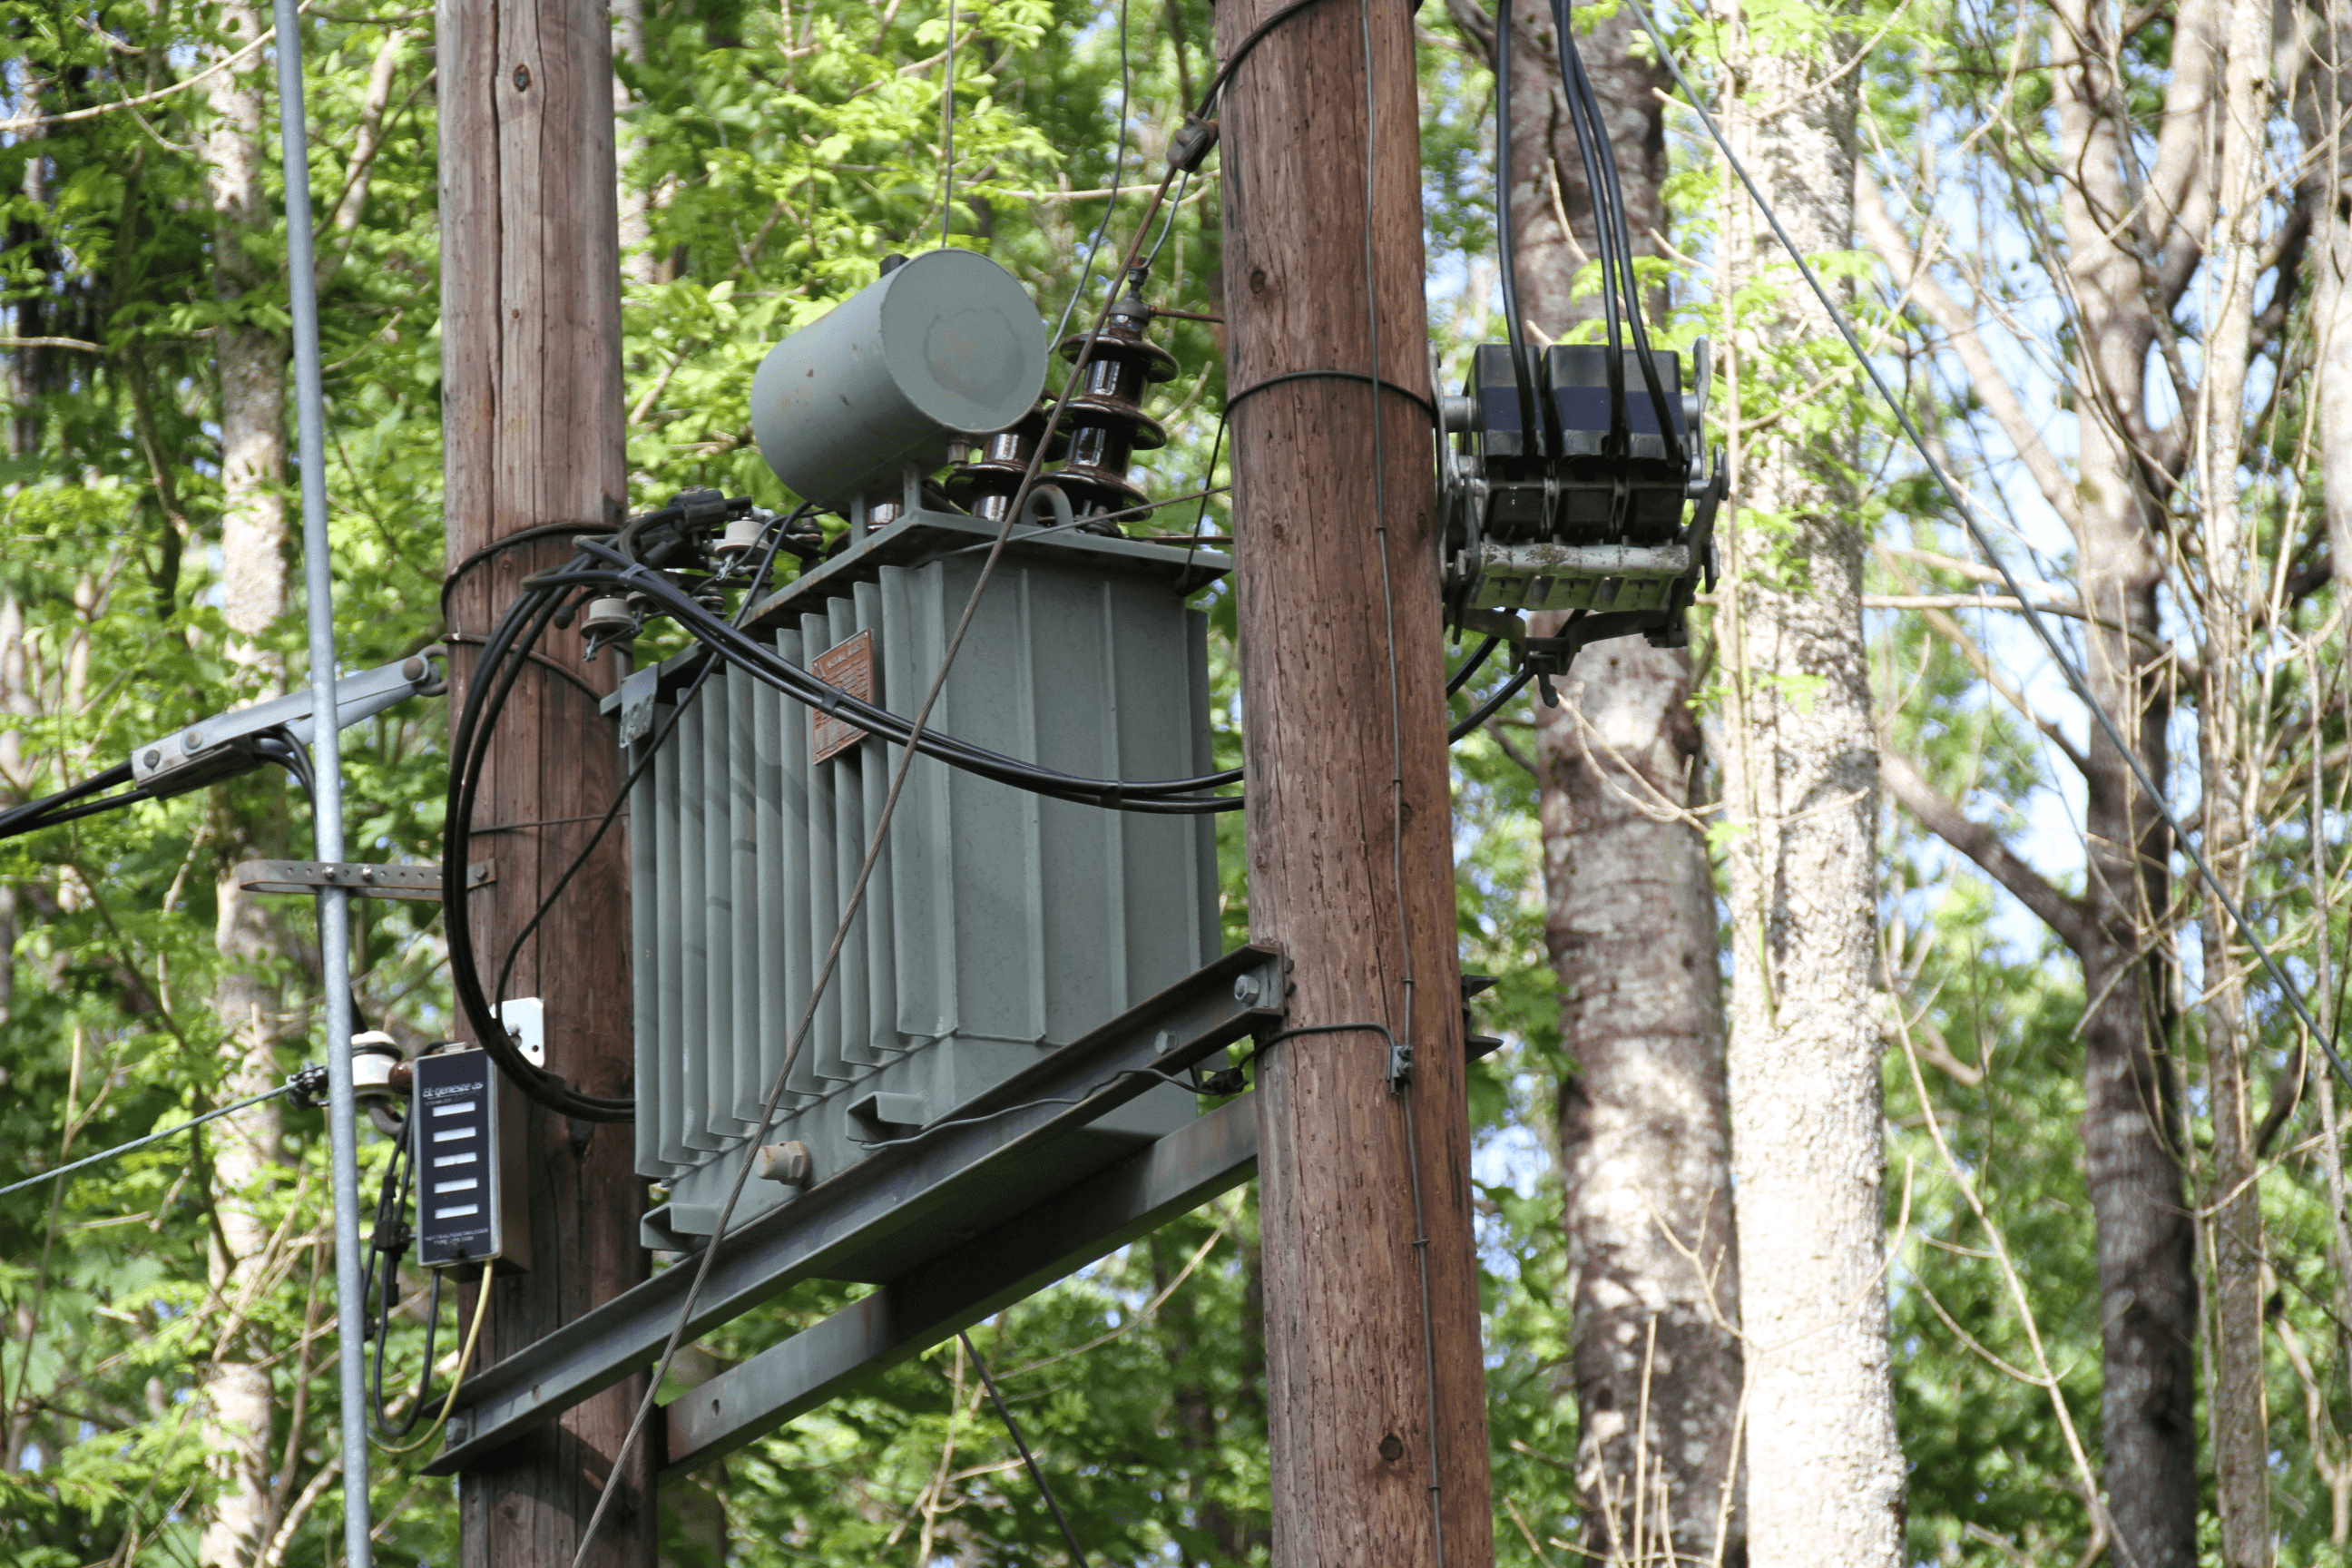 Three Phase Uninterruptible Power Supplies Ups Information Rack Mounted Wiring Diagram